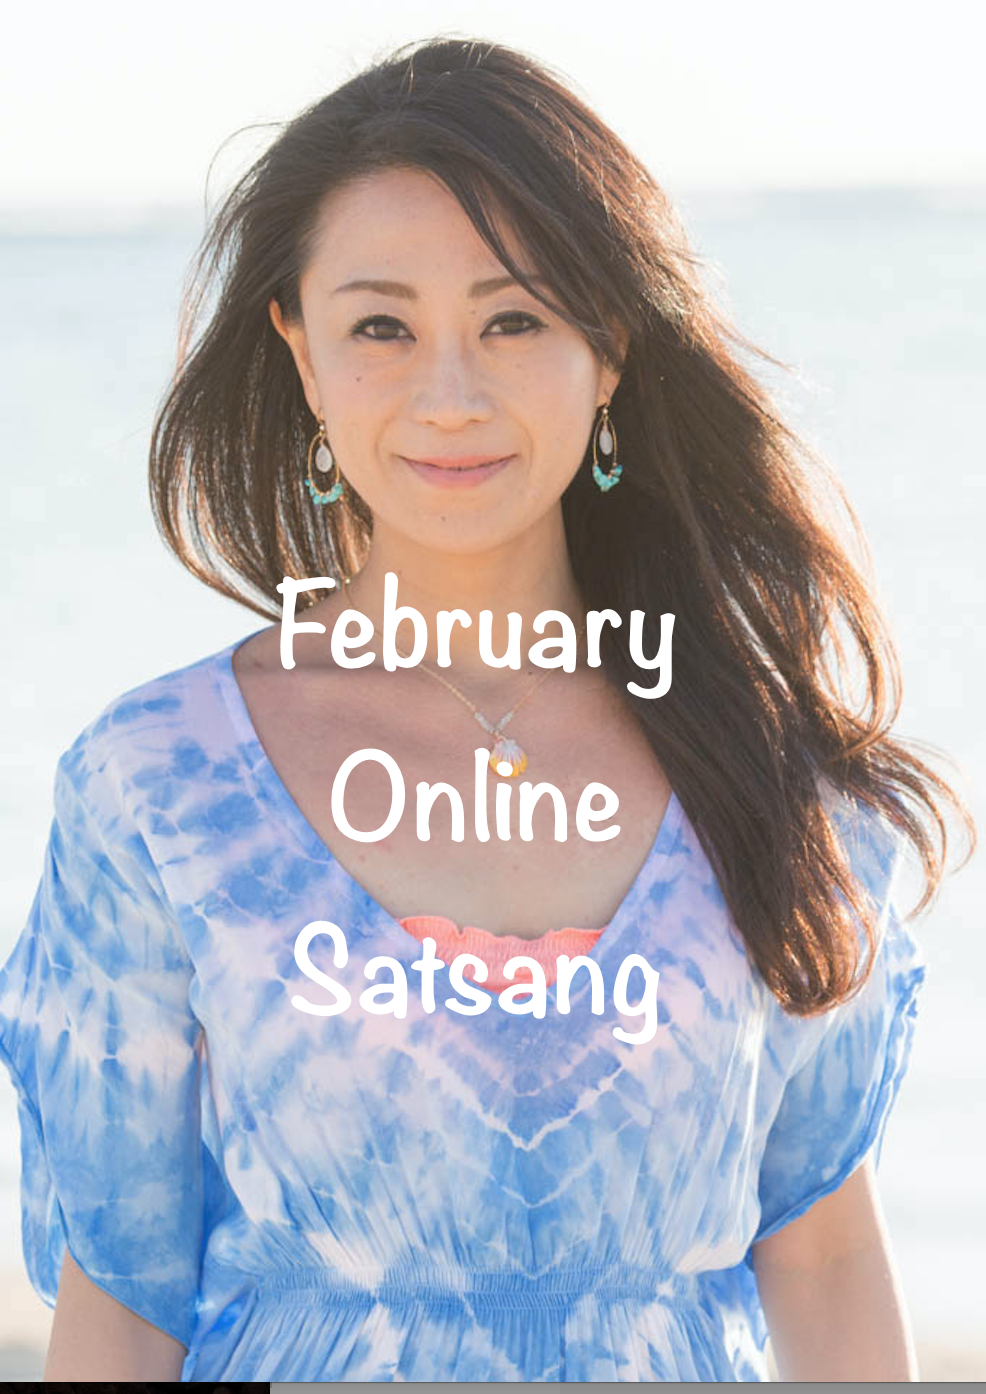 february online satsang